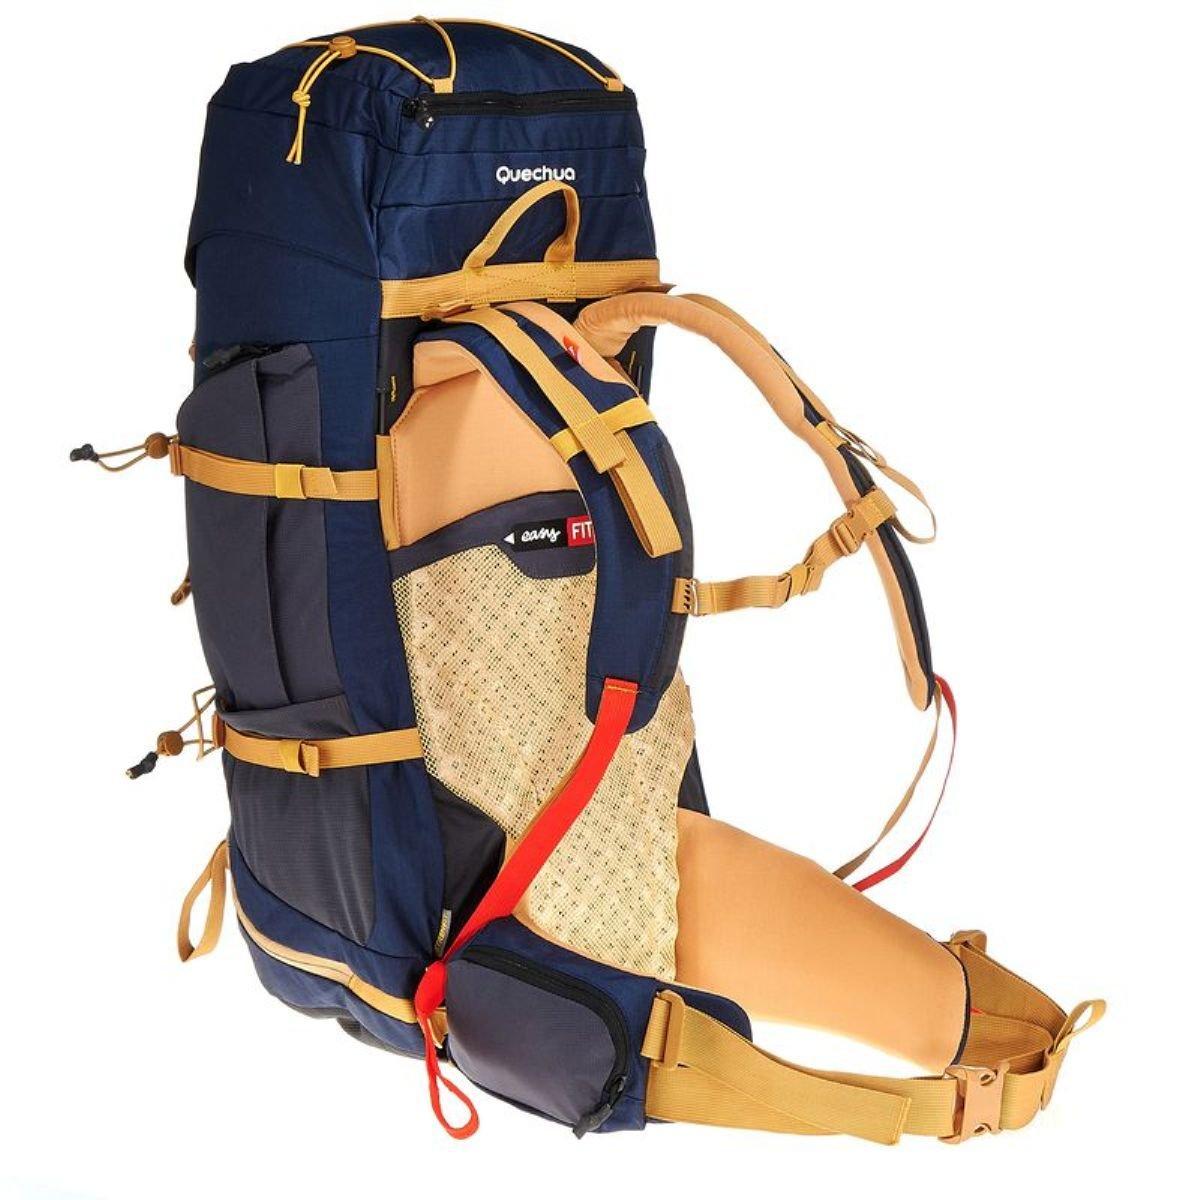 Amazon.com: DECATHLON QUECHUA FORCLAZ 50 EASYFIT MEN MULTIDAY TREKKING BACKPACK: Clothing